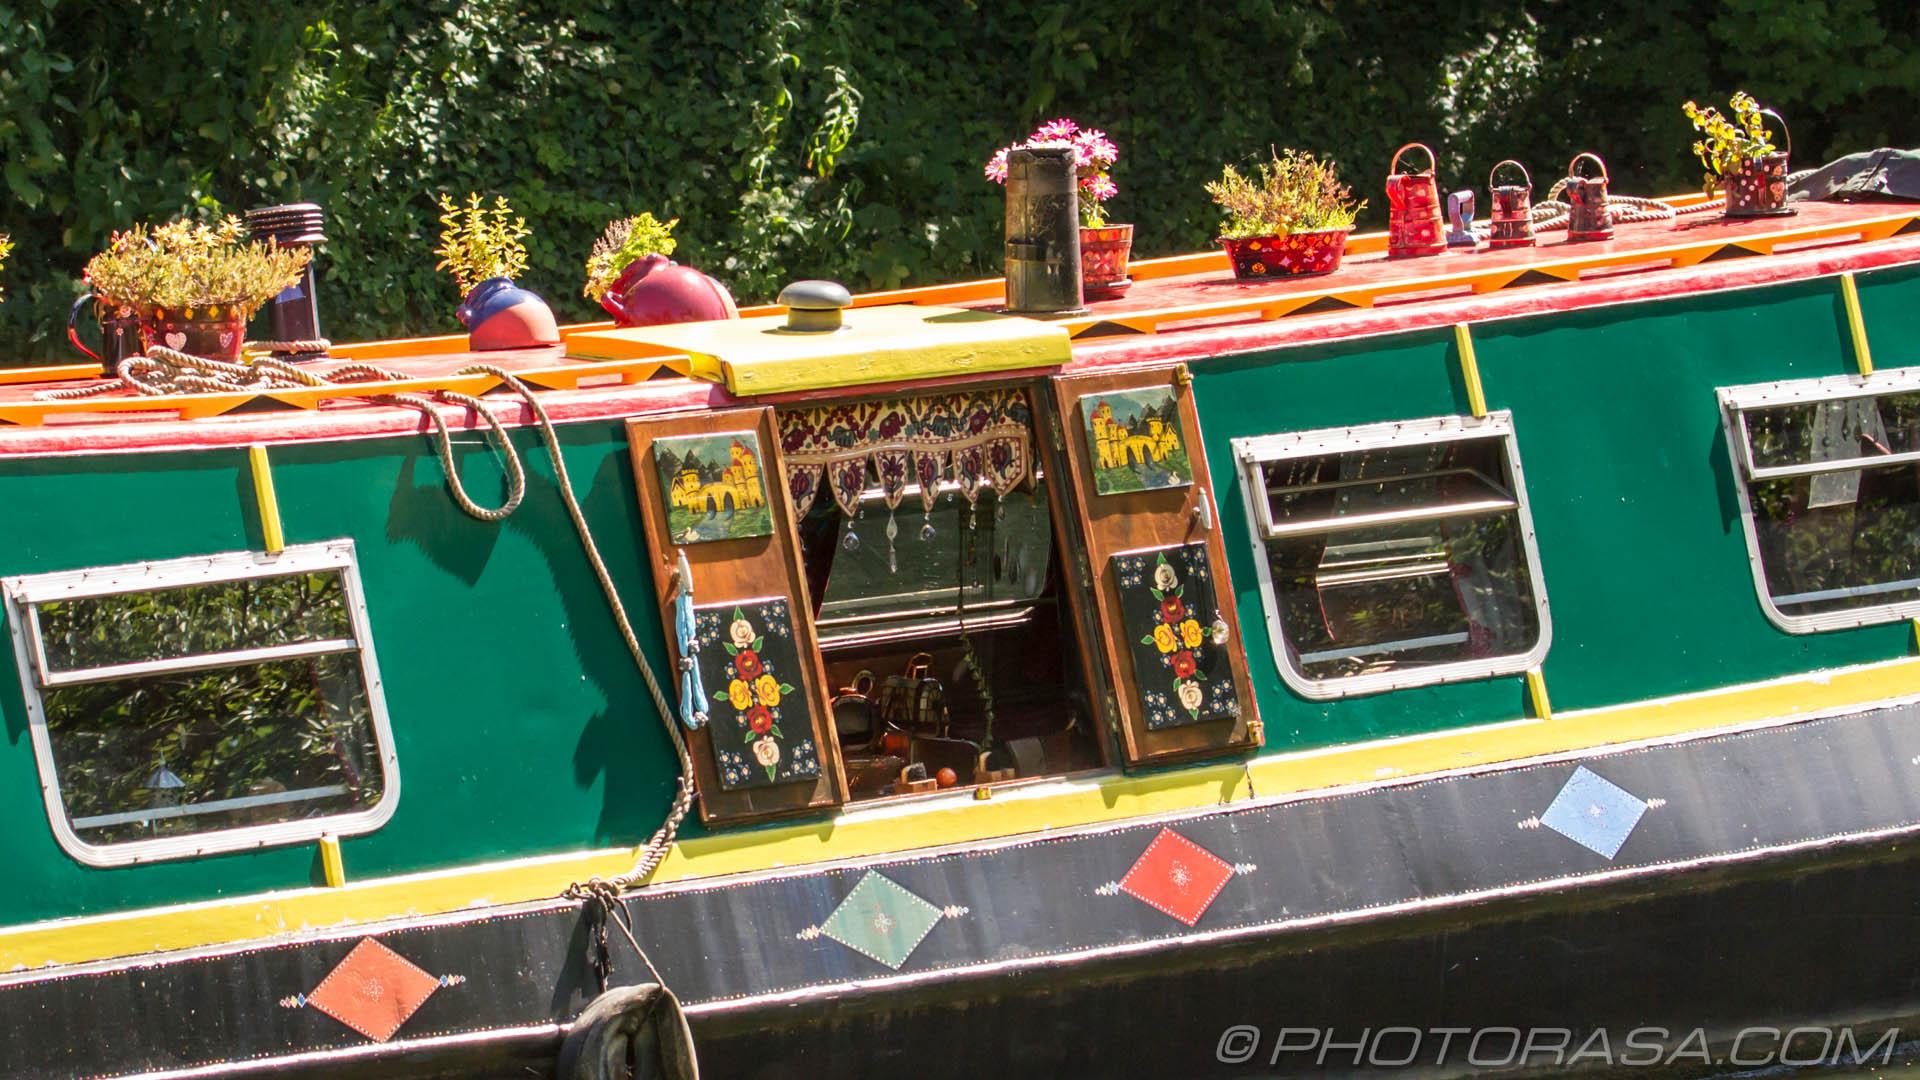 https://photorasa.com/maidstone/colourful-river-barge/